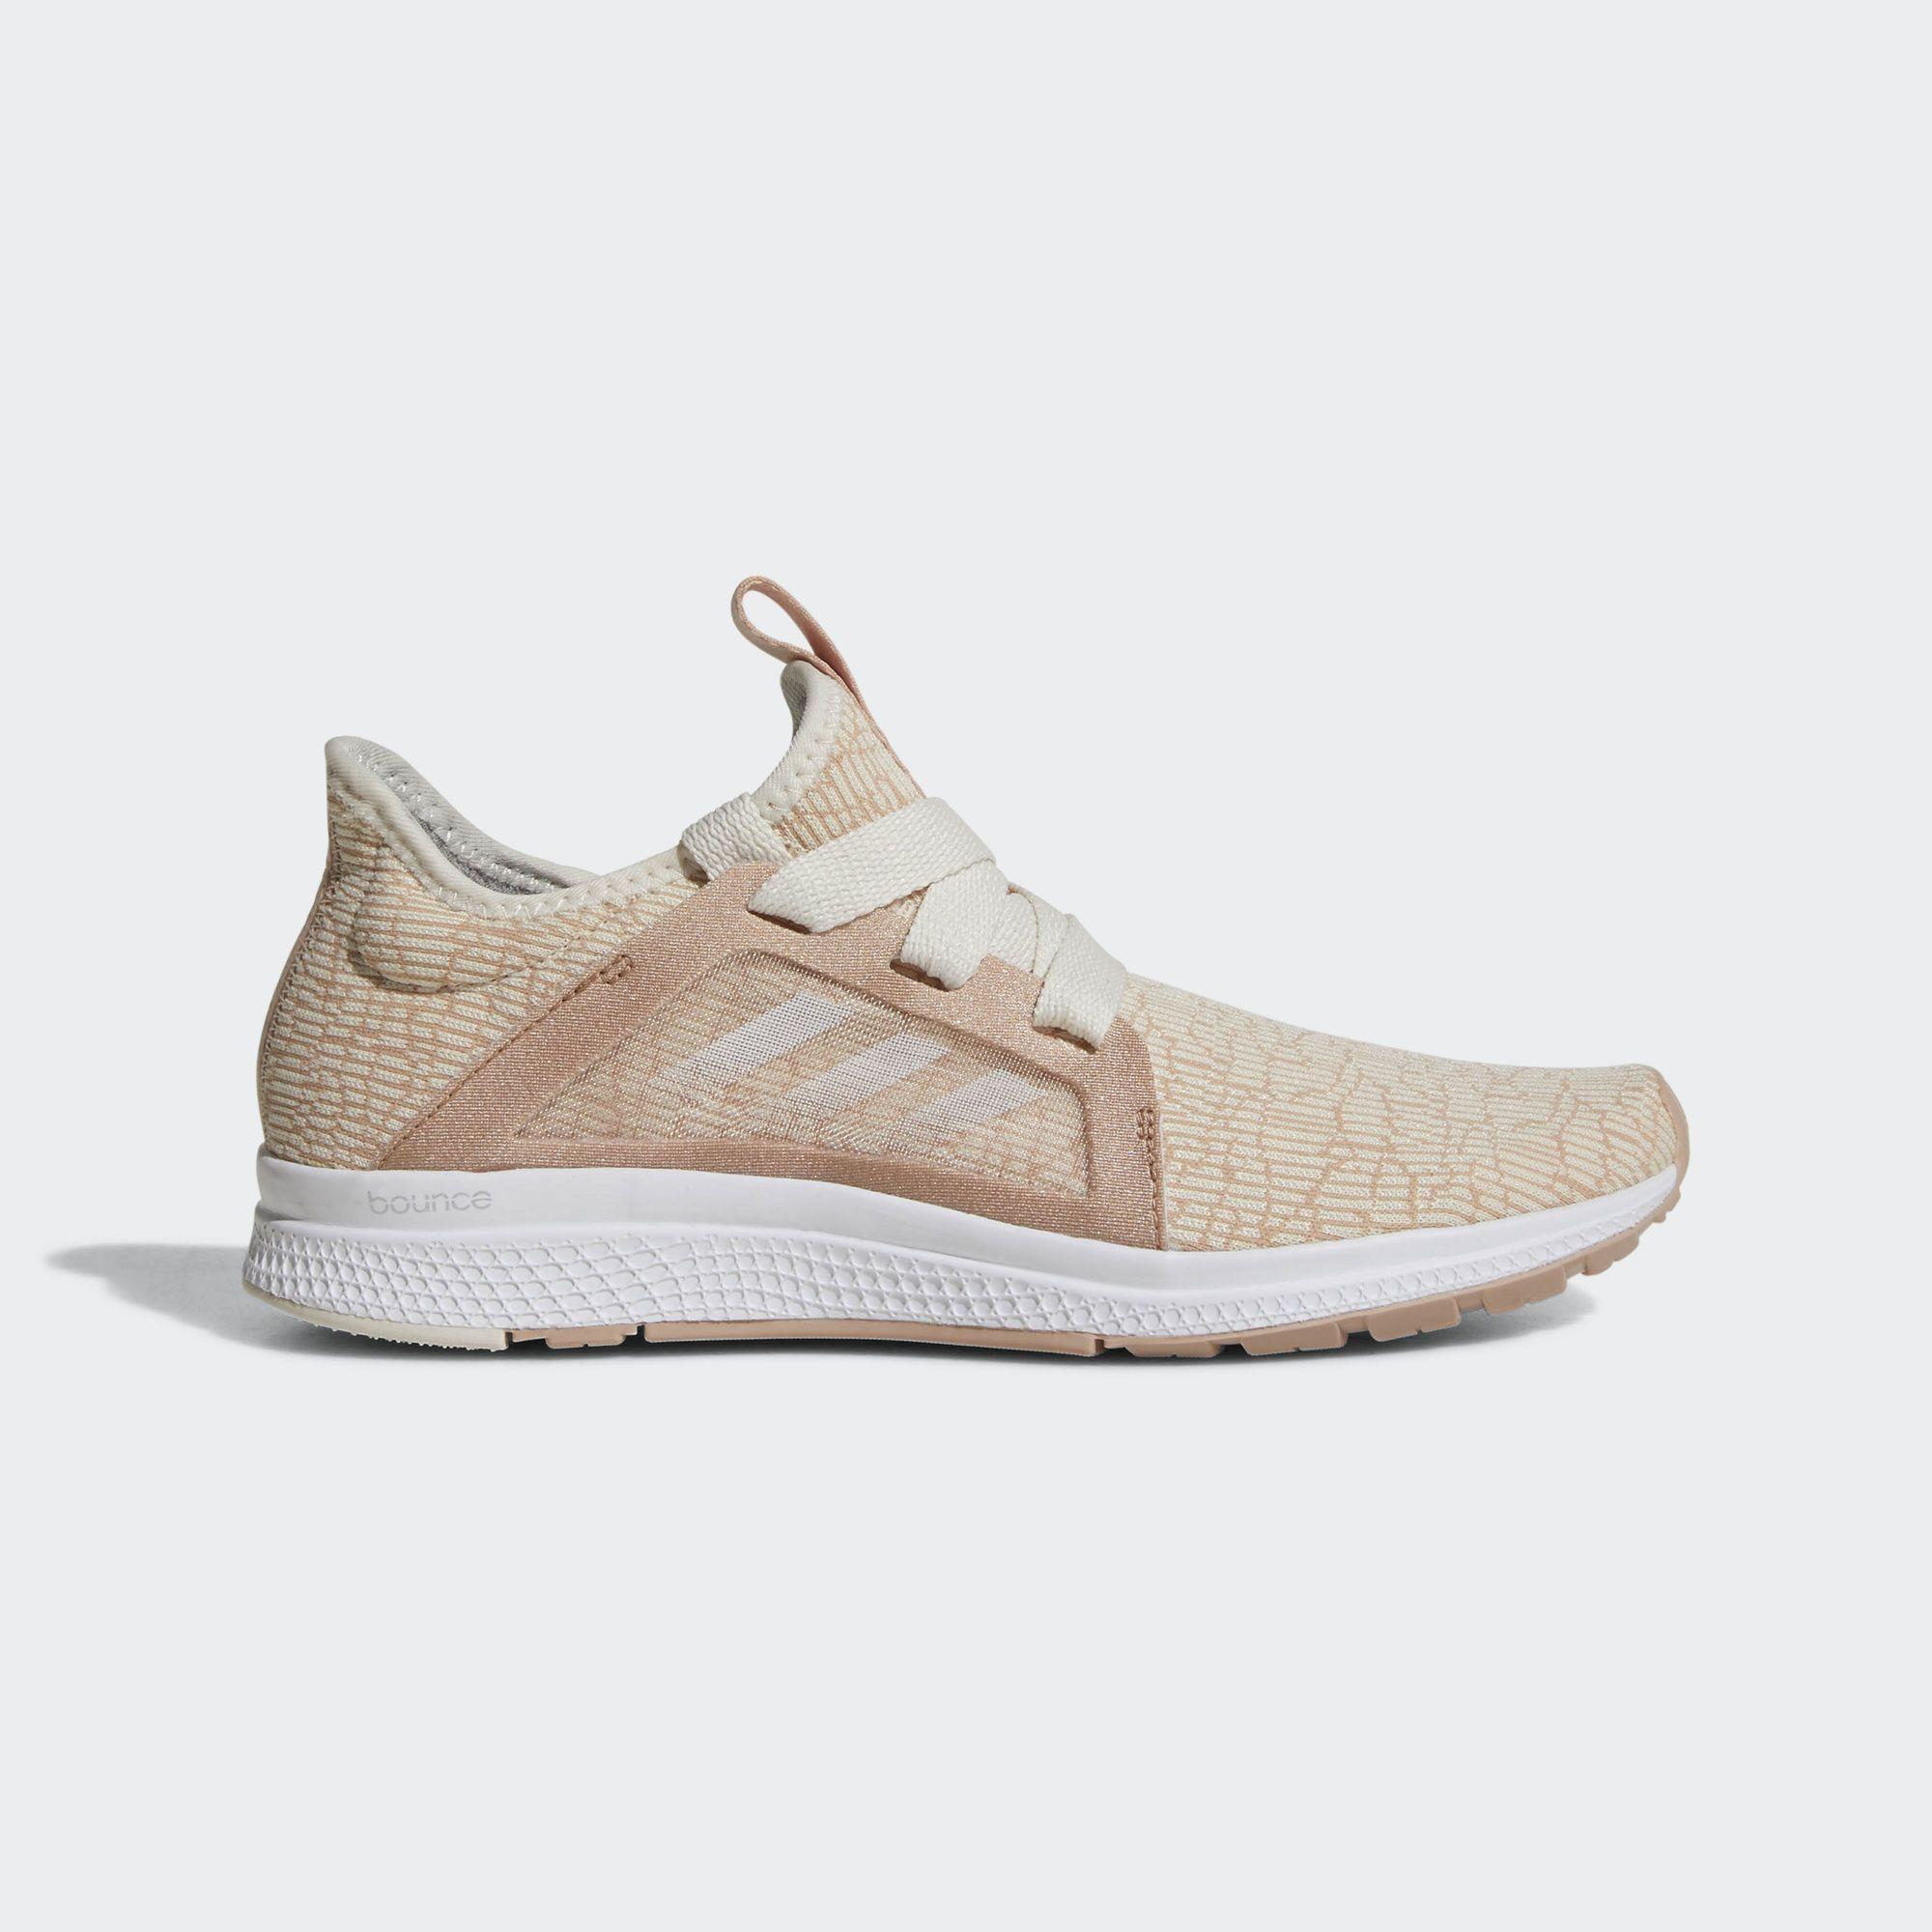 Reebok Slip-on Chaussures De Sport - Nue & Tons Neutres HvxKdExvhC